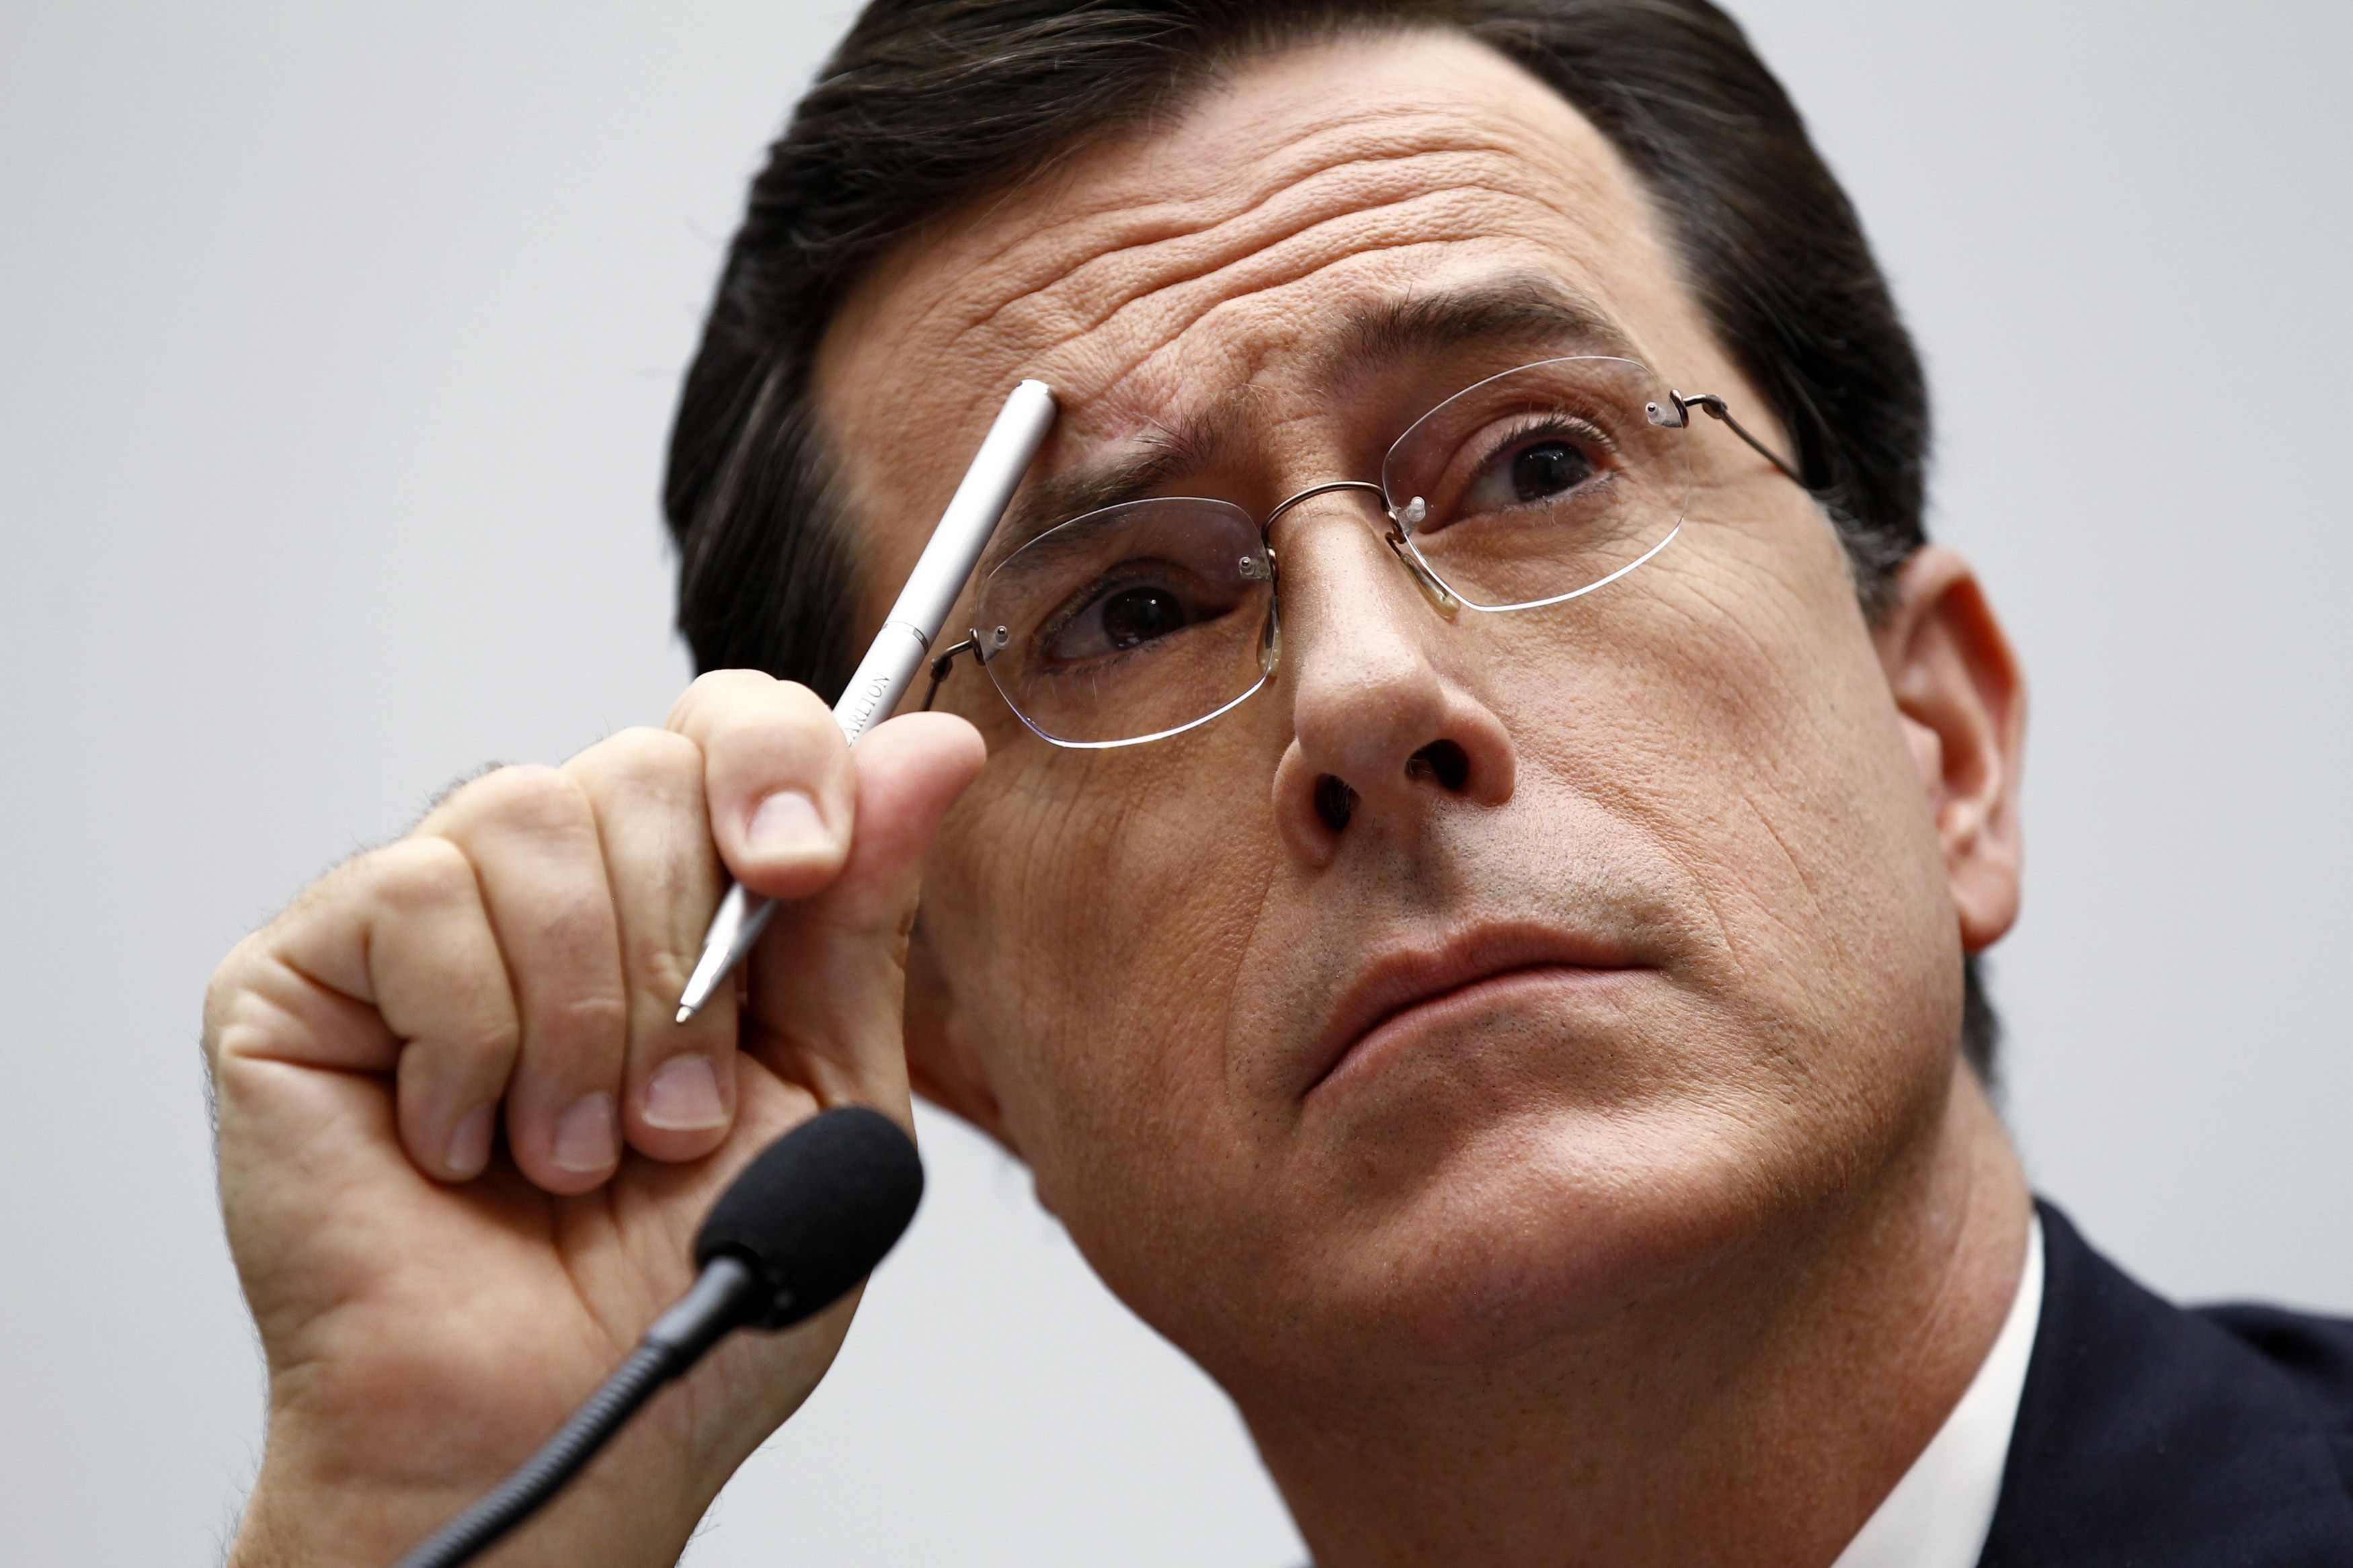 Stephen Colbert Background